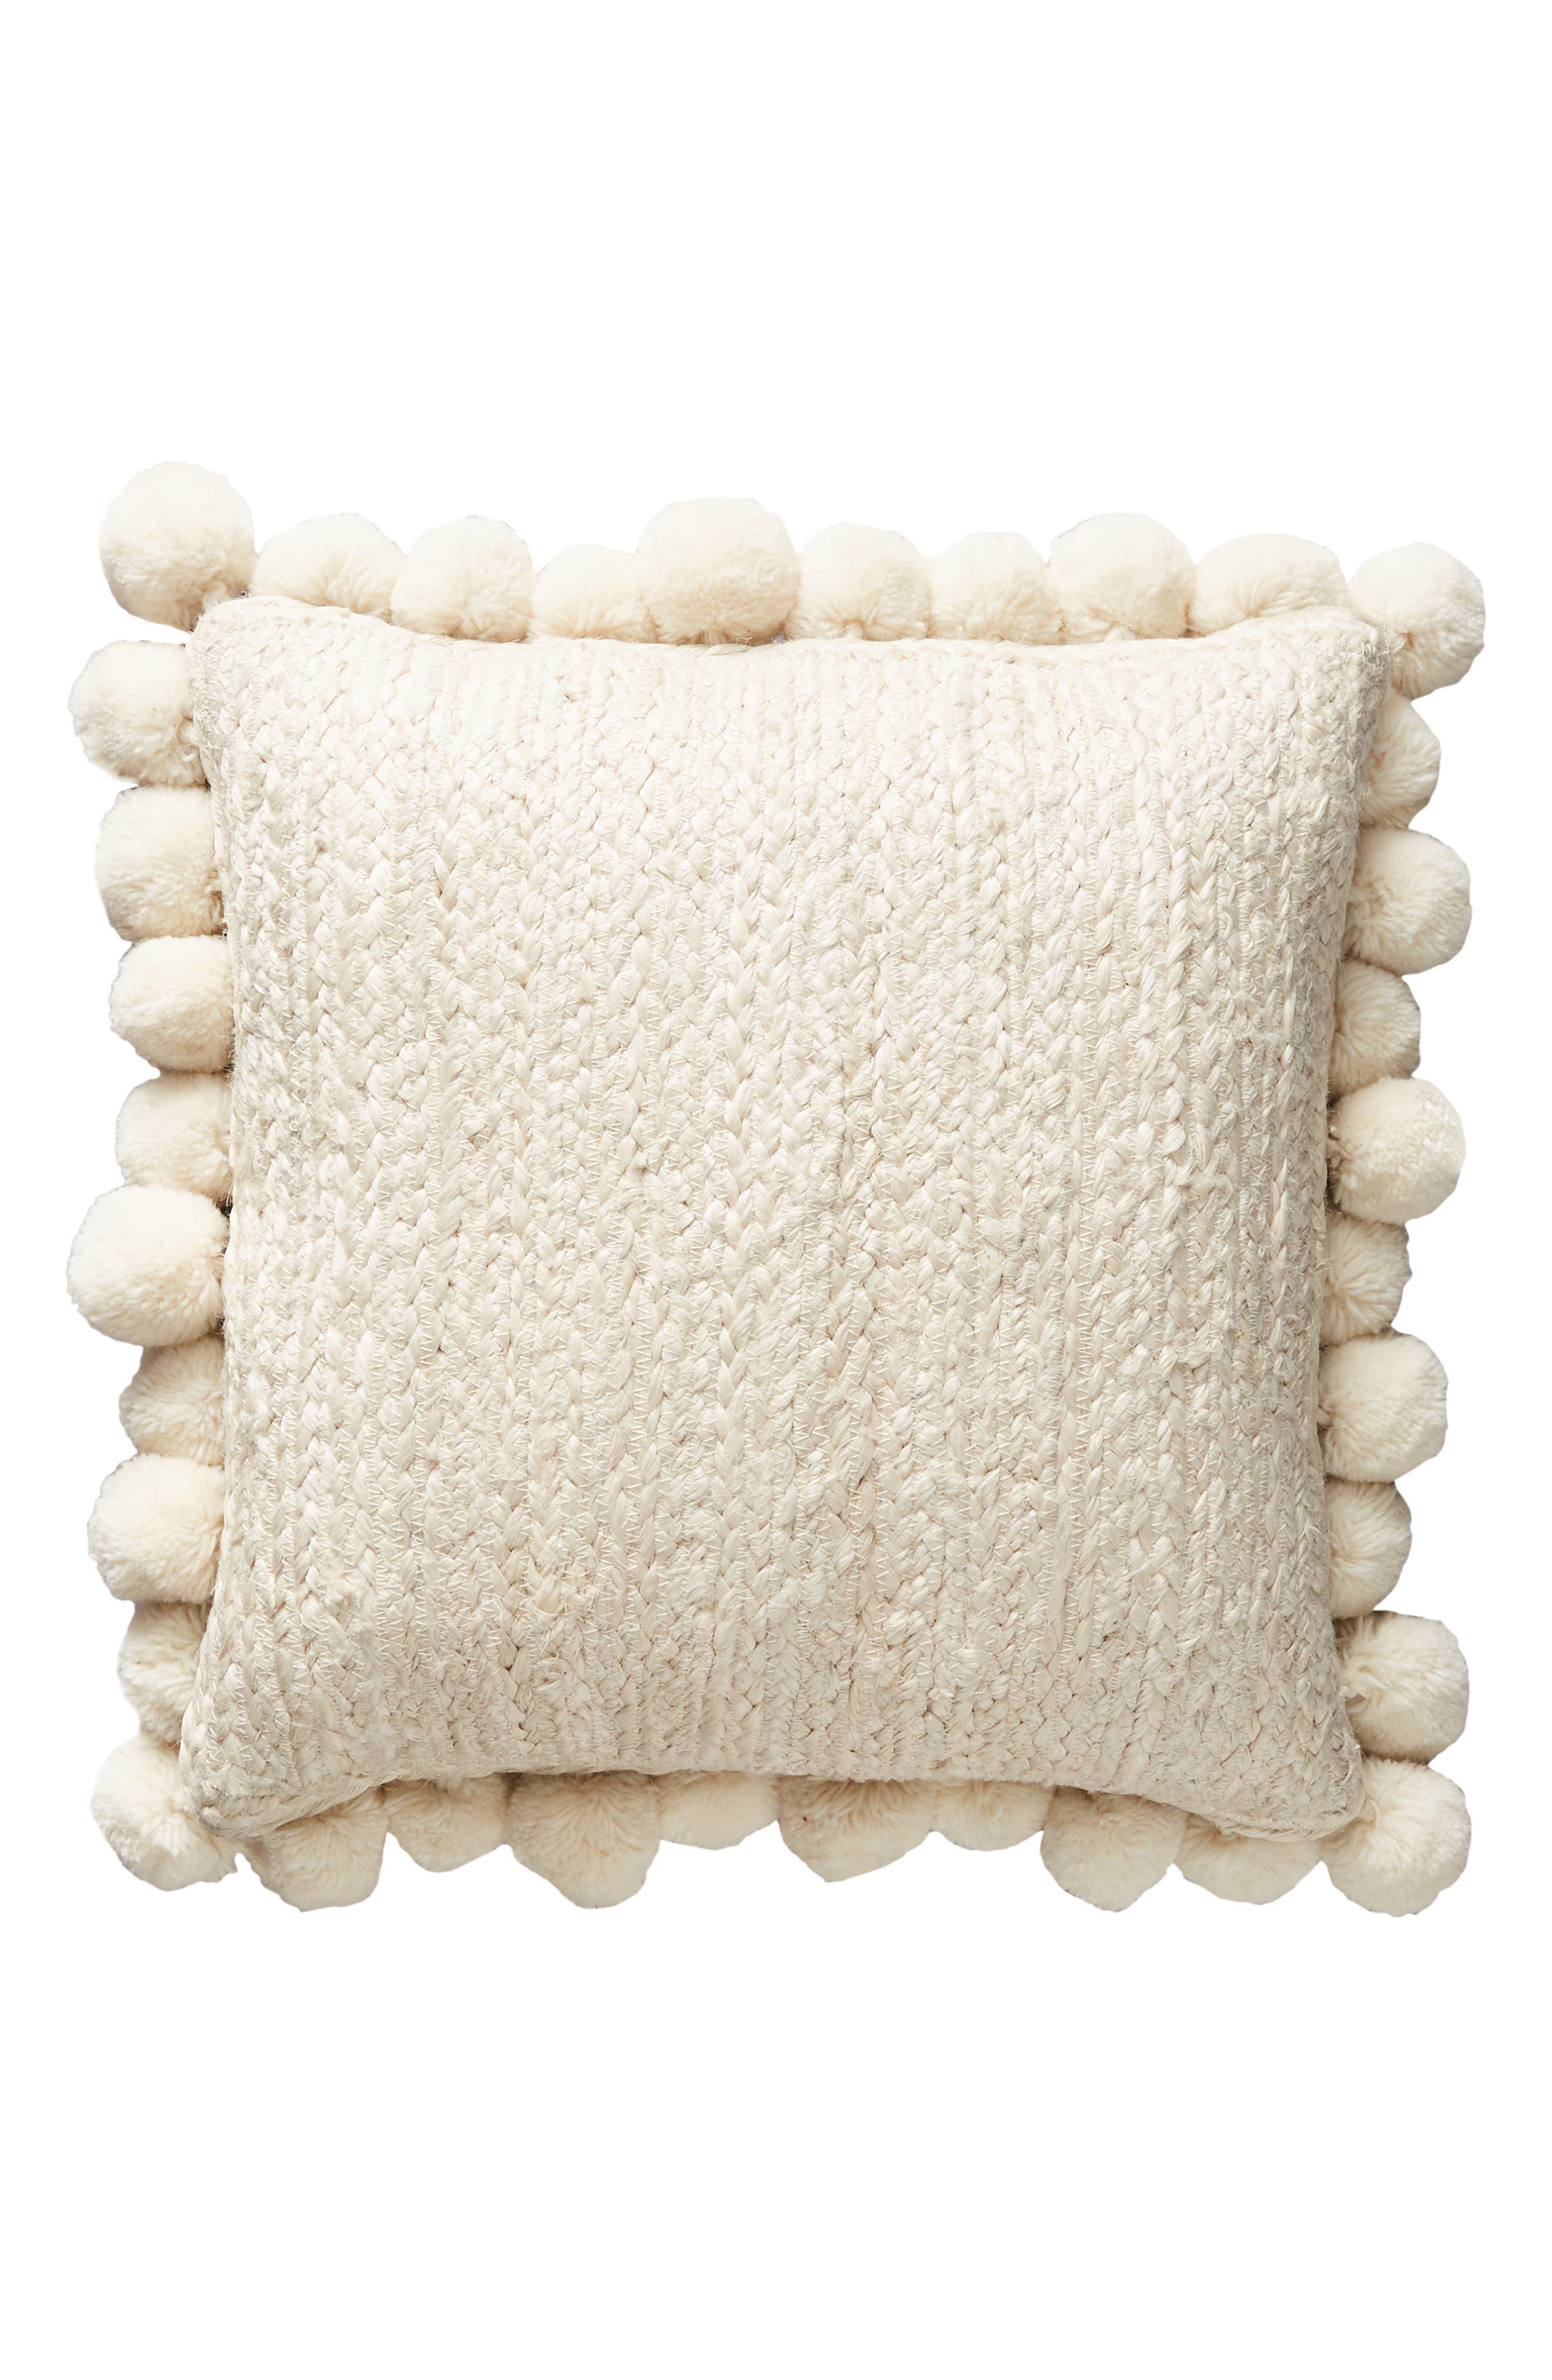 Pompom Jute Accent Pillow,                             Alternate thumbnail 4, color,                             IVORY